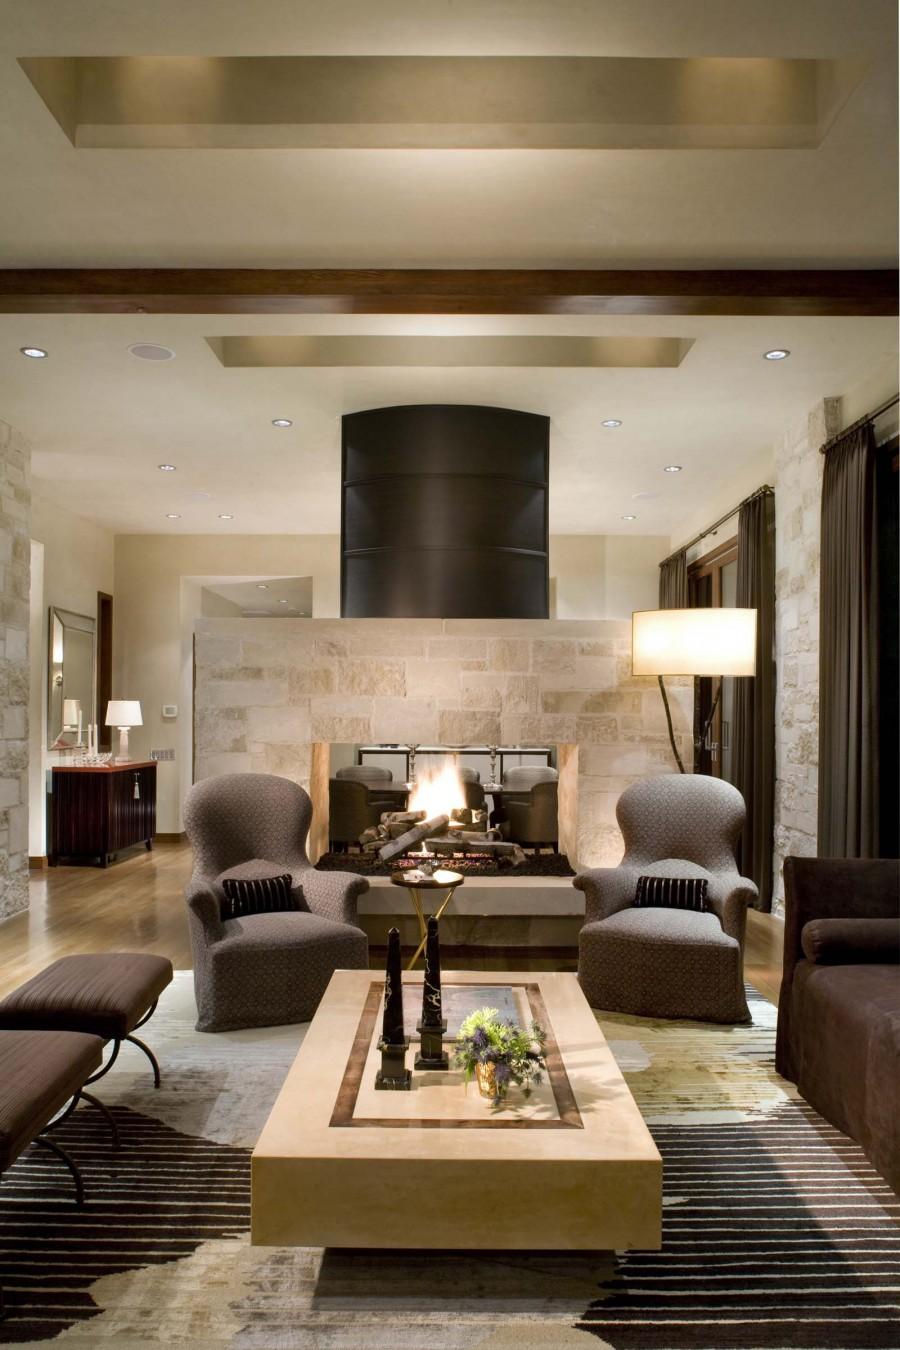 16 Fabulous Earth Tones Living Room Designs - Decoholic on Room Decor.  id=38109